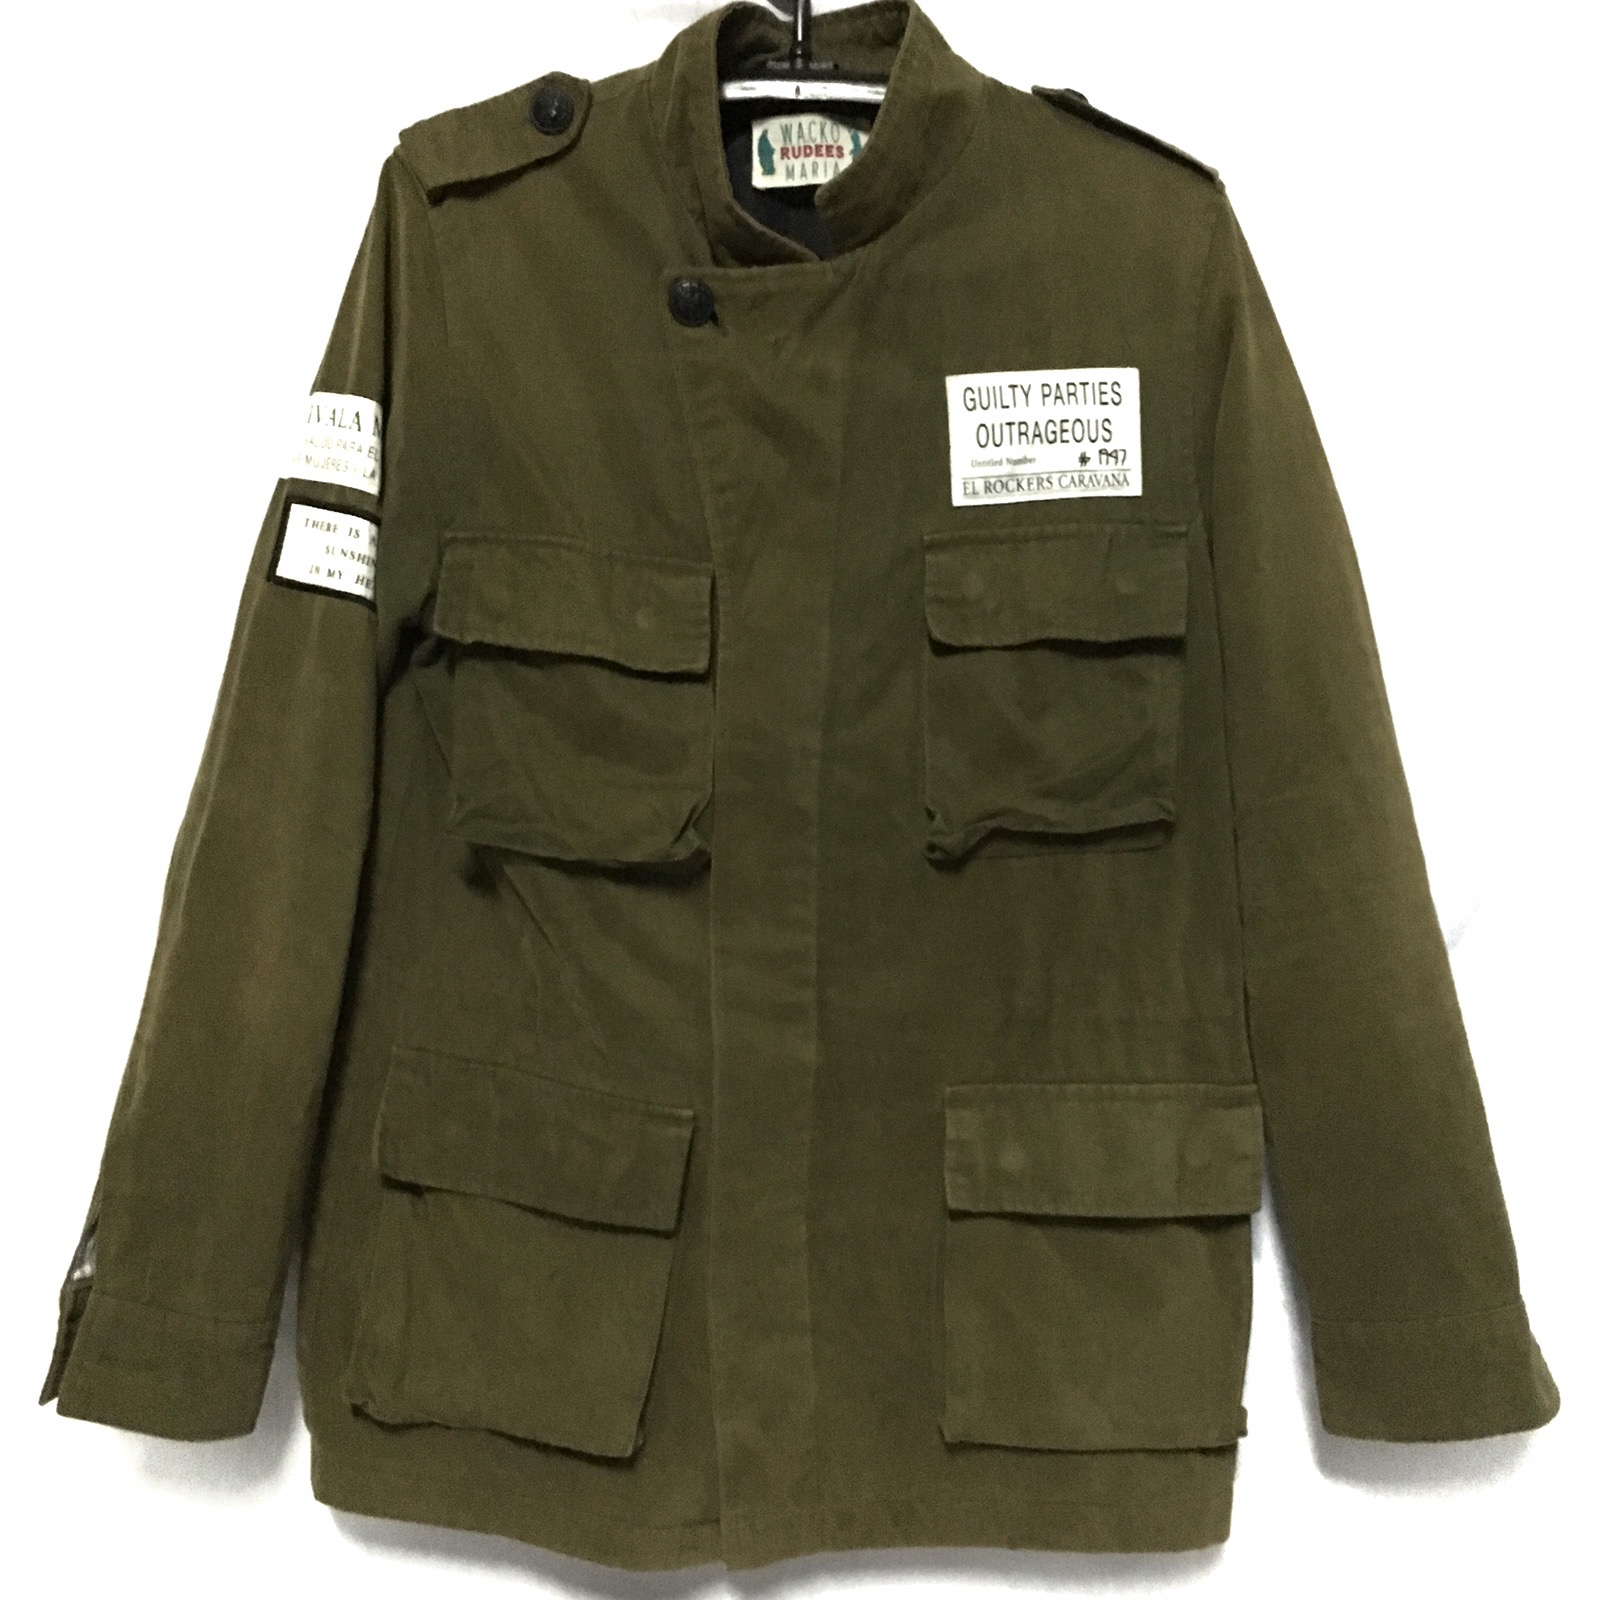 dae566870e73 Wacko Maria Army Light Jacket Four Pocket Green Color not comme des garcons  helmut lang pierre